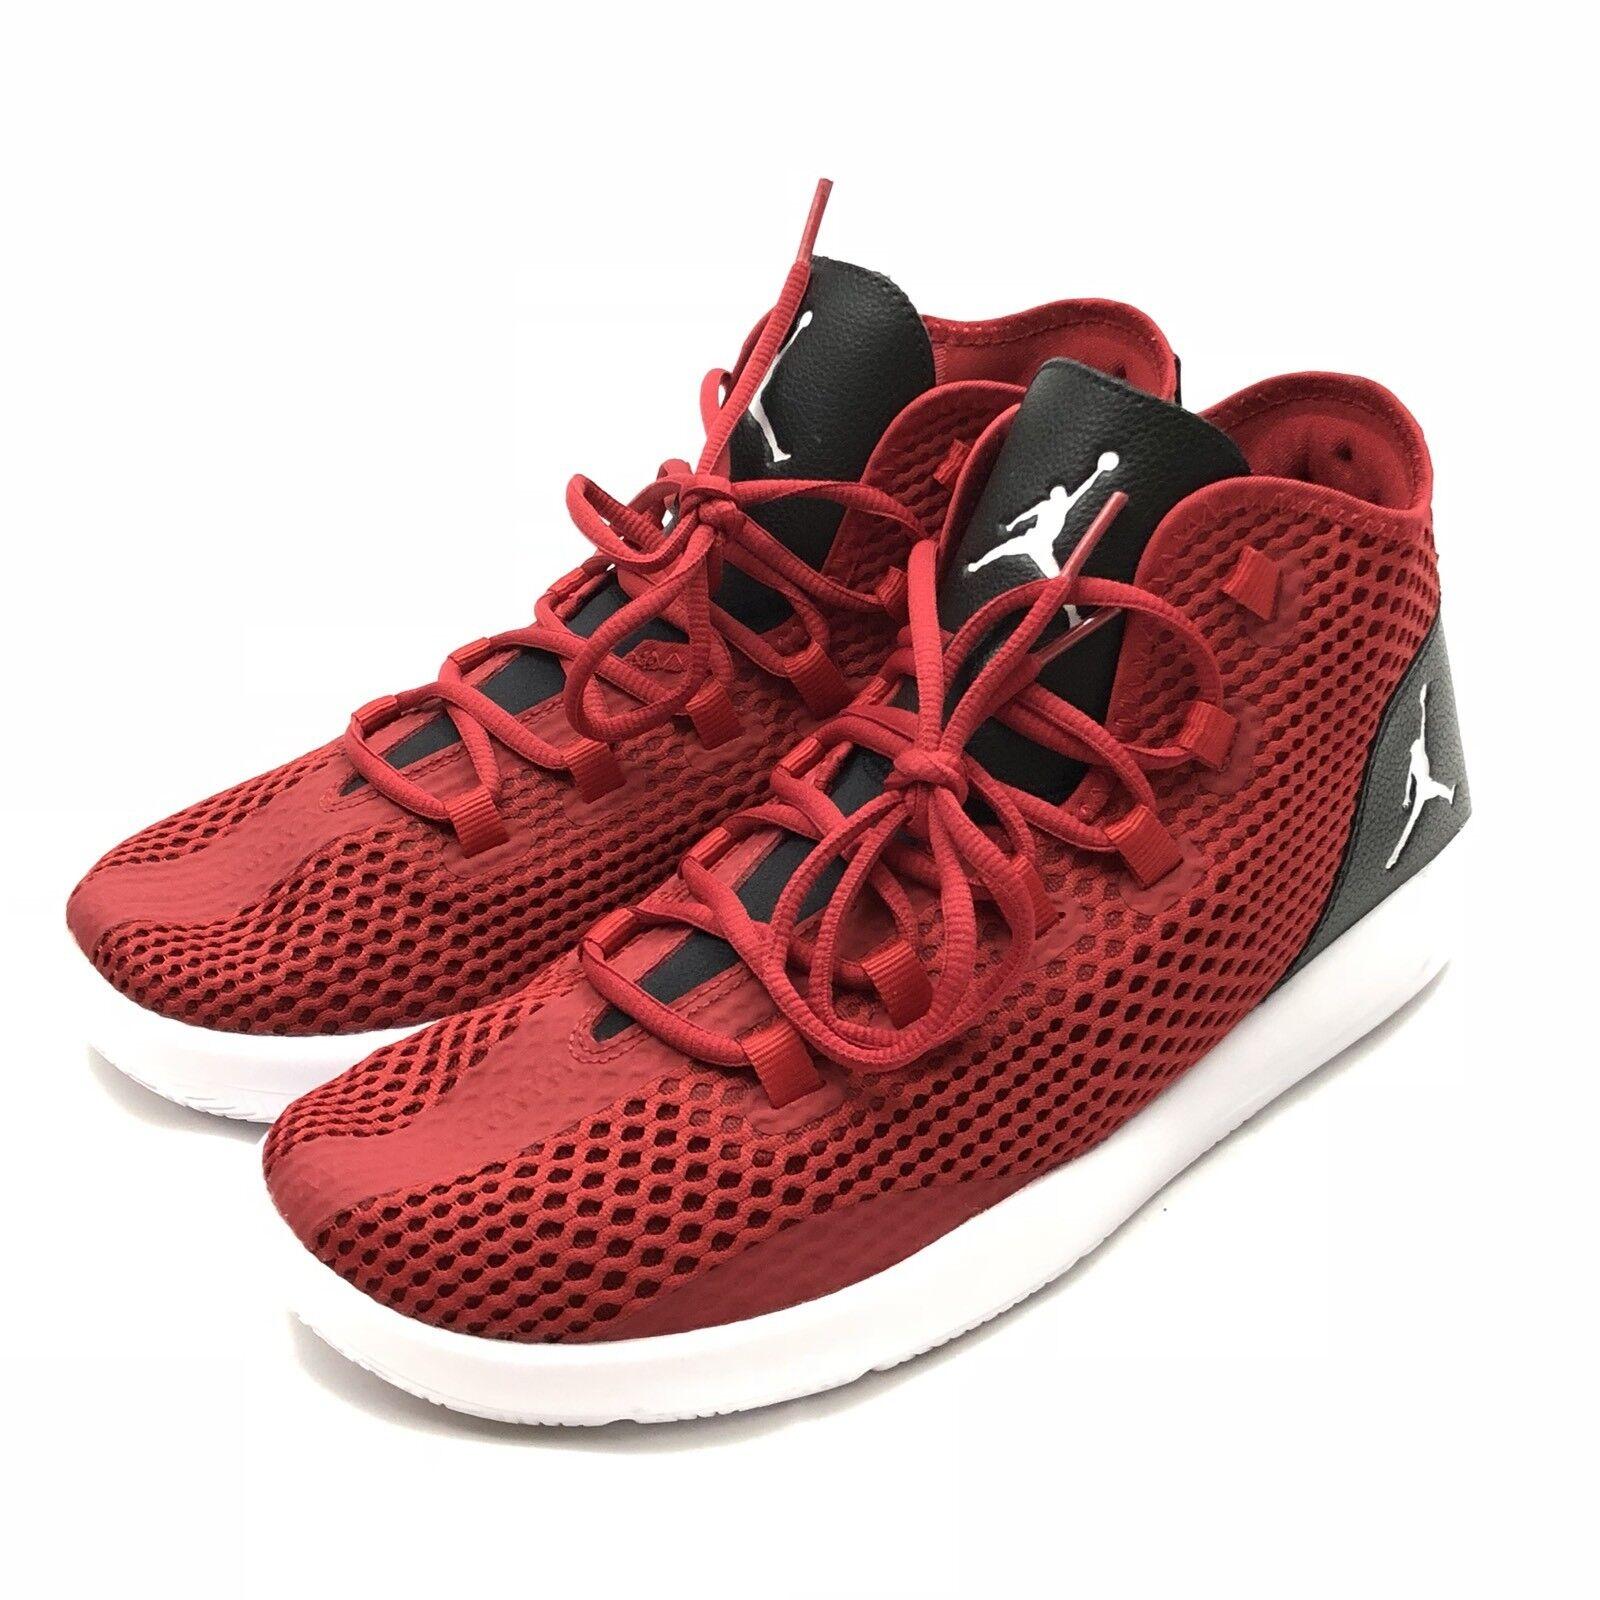 Nike air zeigen jordan zeigen air männer im rot - schwarz größe 12 834064 605 f505fd